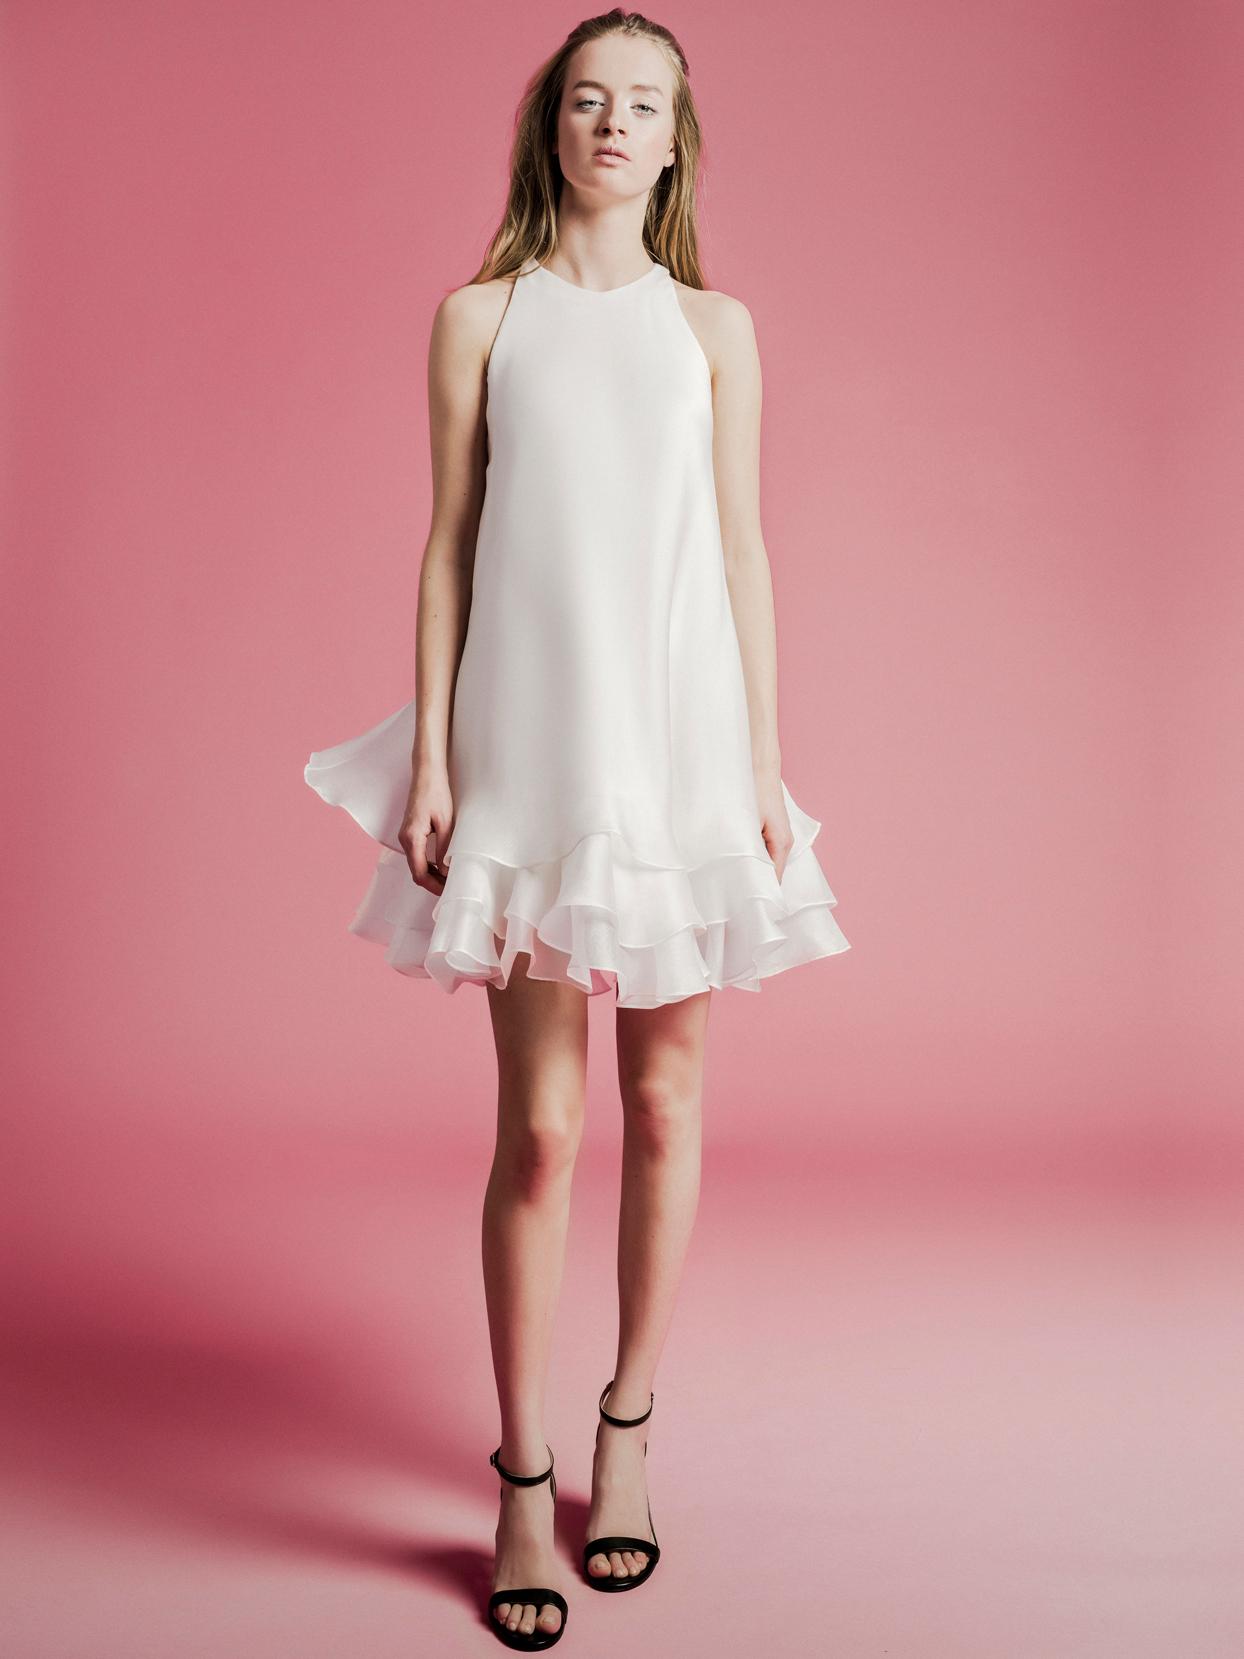 Sophie Et Voilà short ruffled high neck wedding dress spring 2021